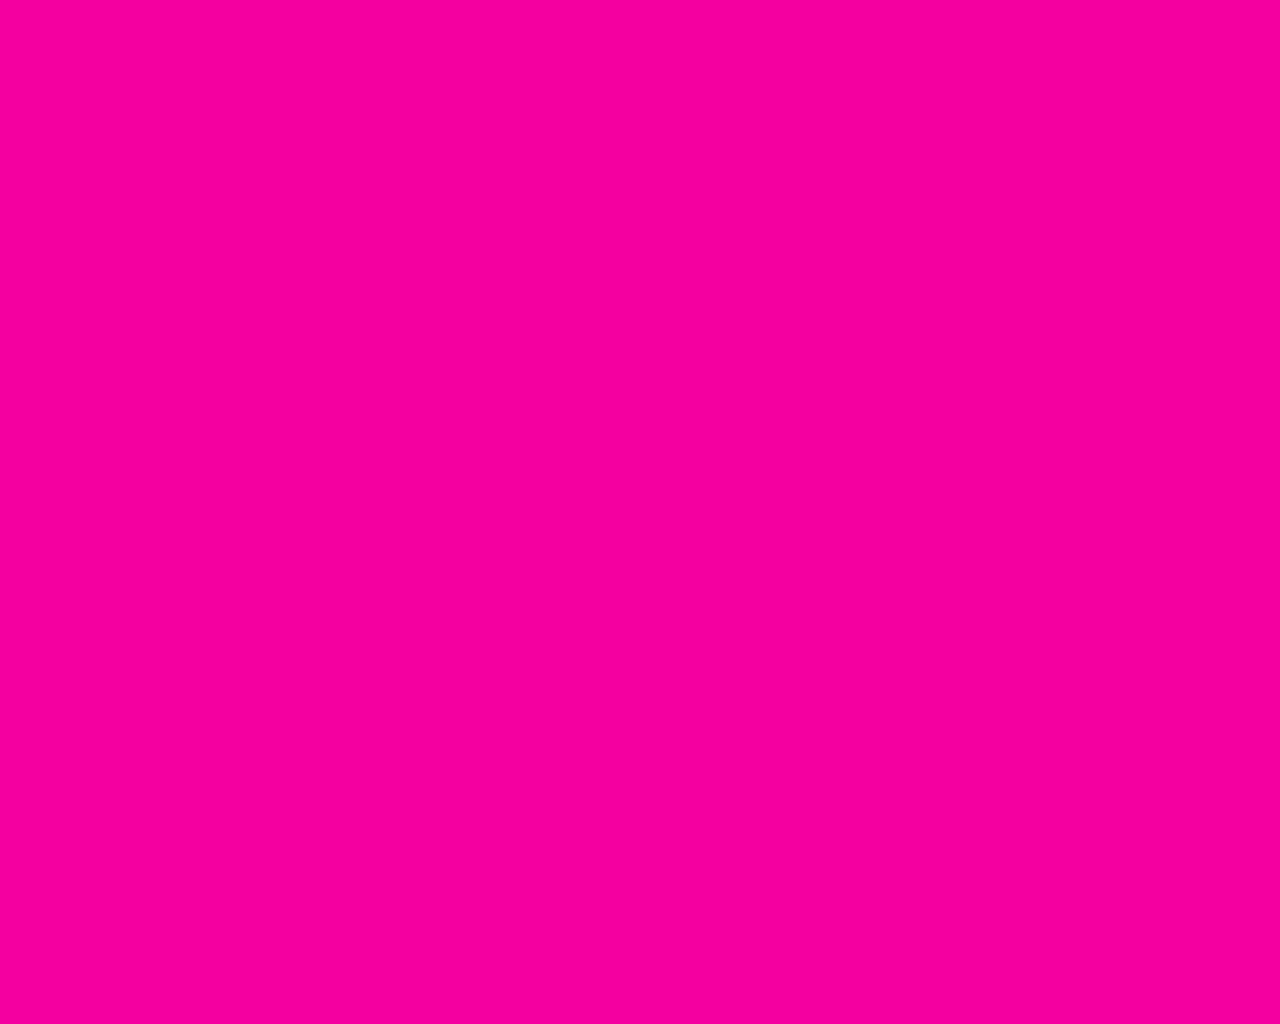 1280x1024 Fashion Fuchsia Solid Color Background